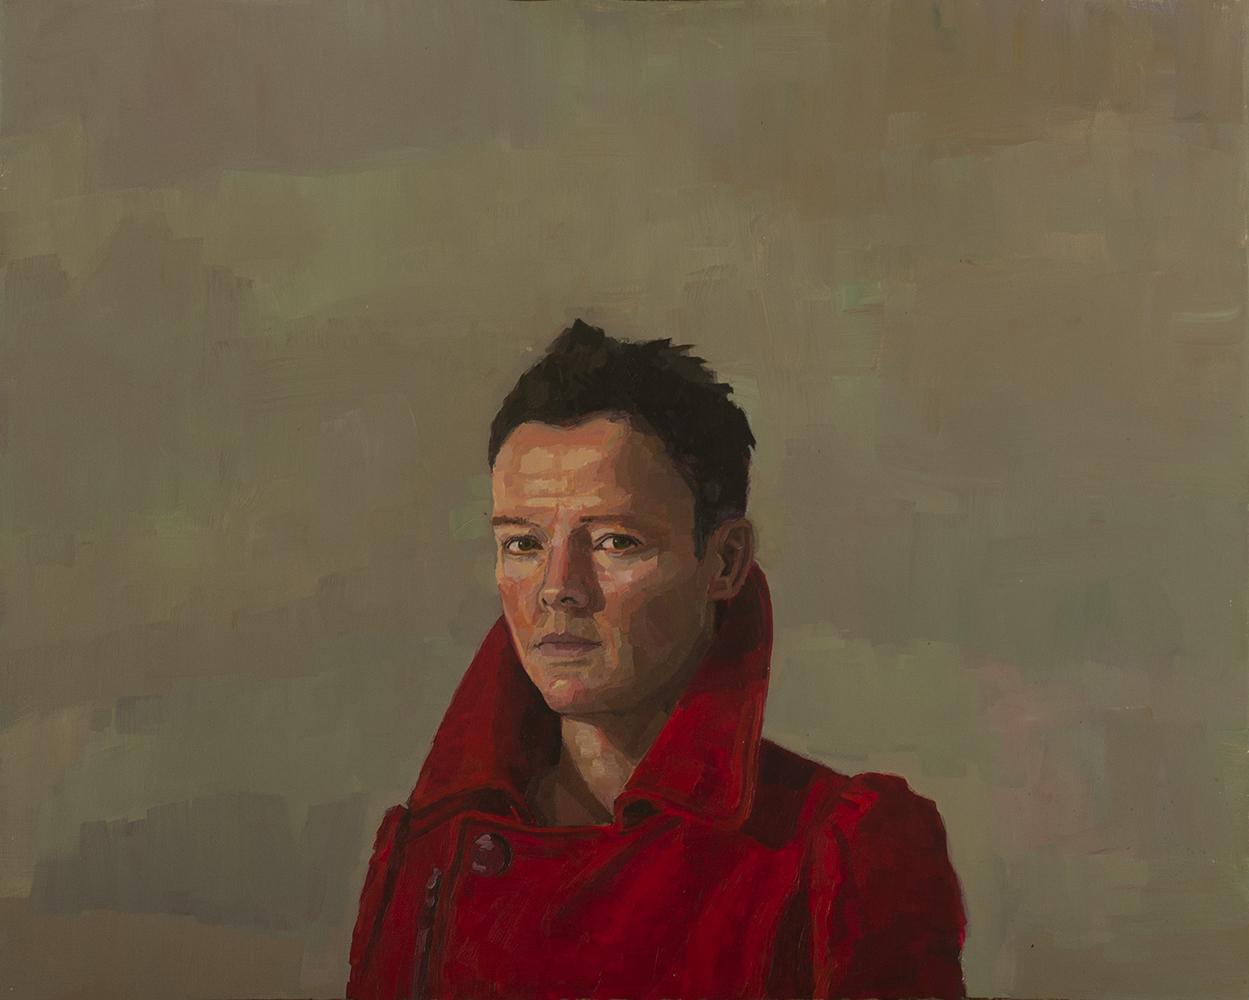 Self portrait in red coat